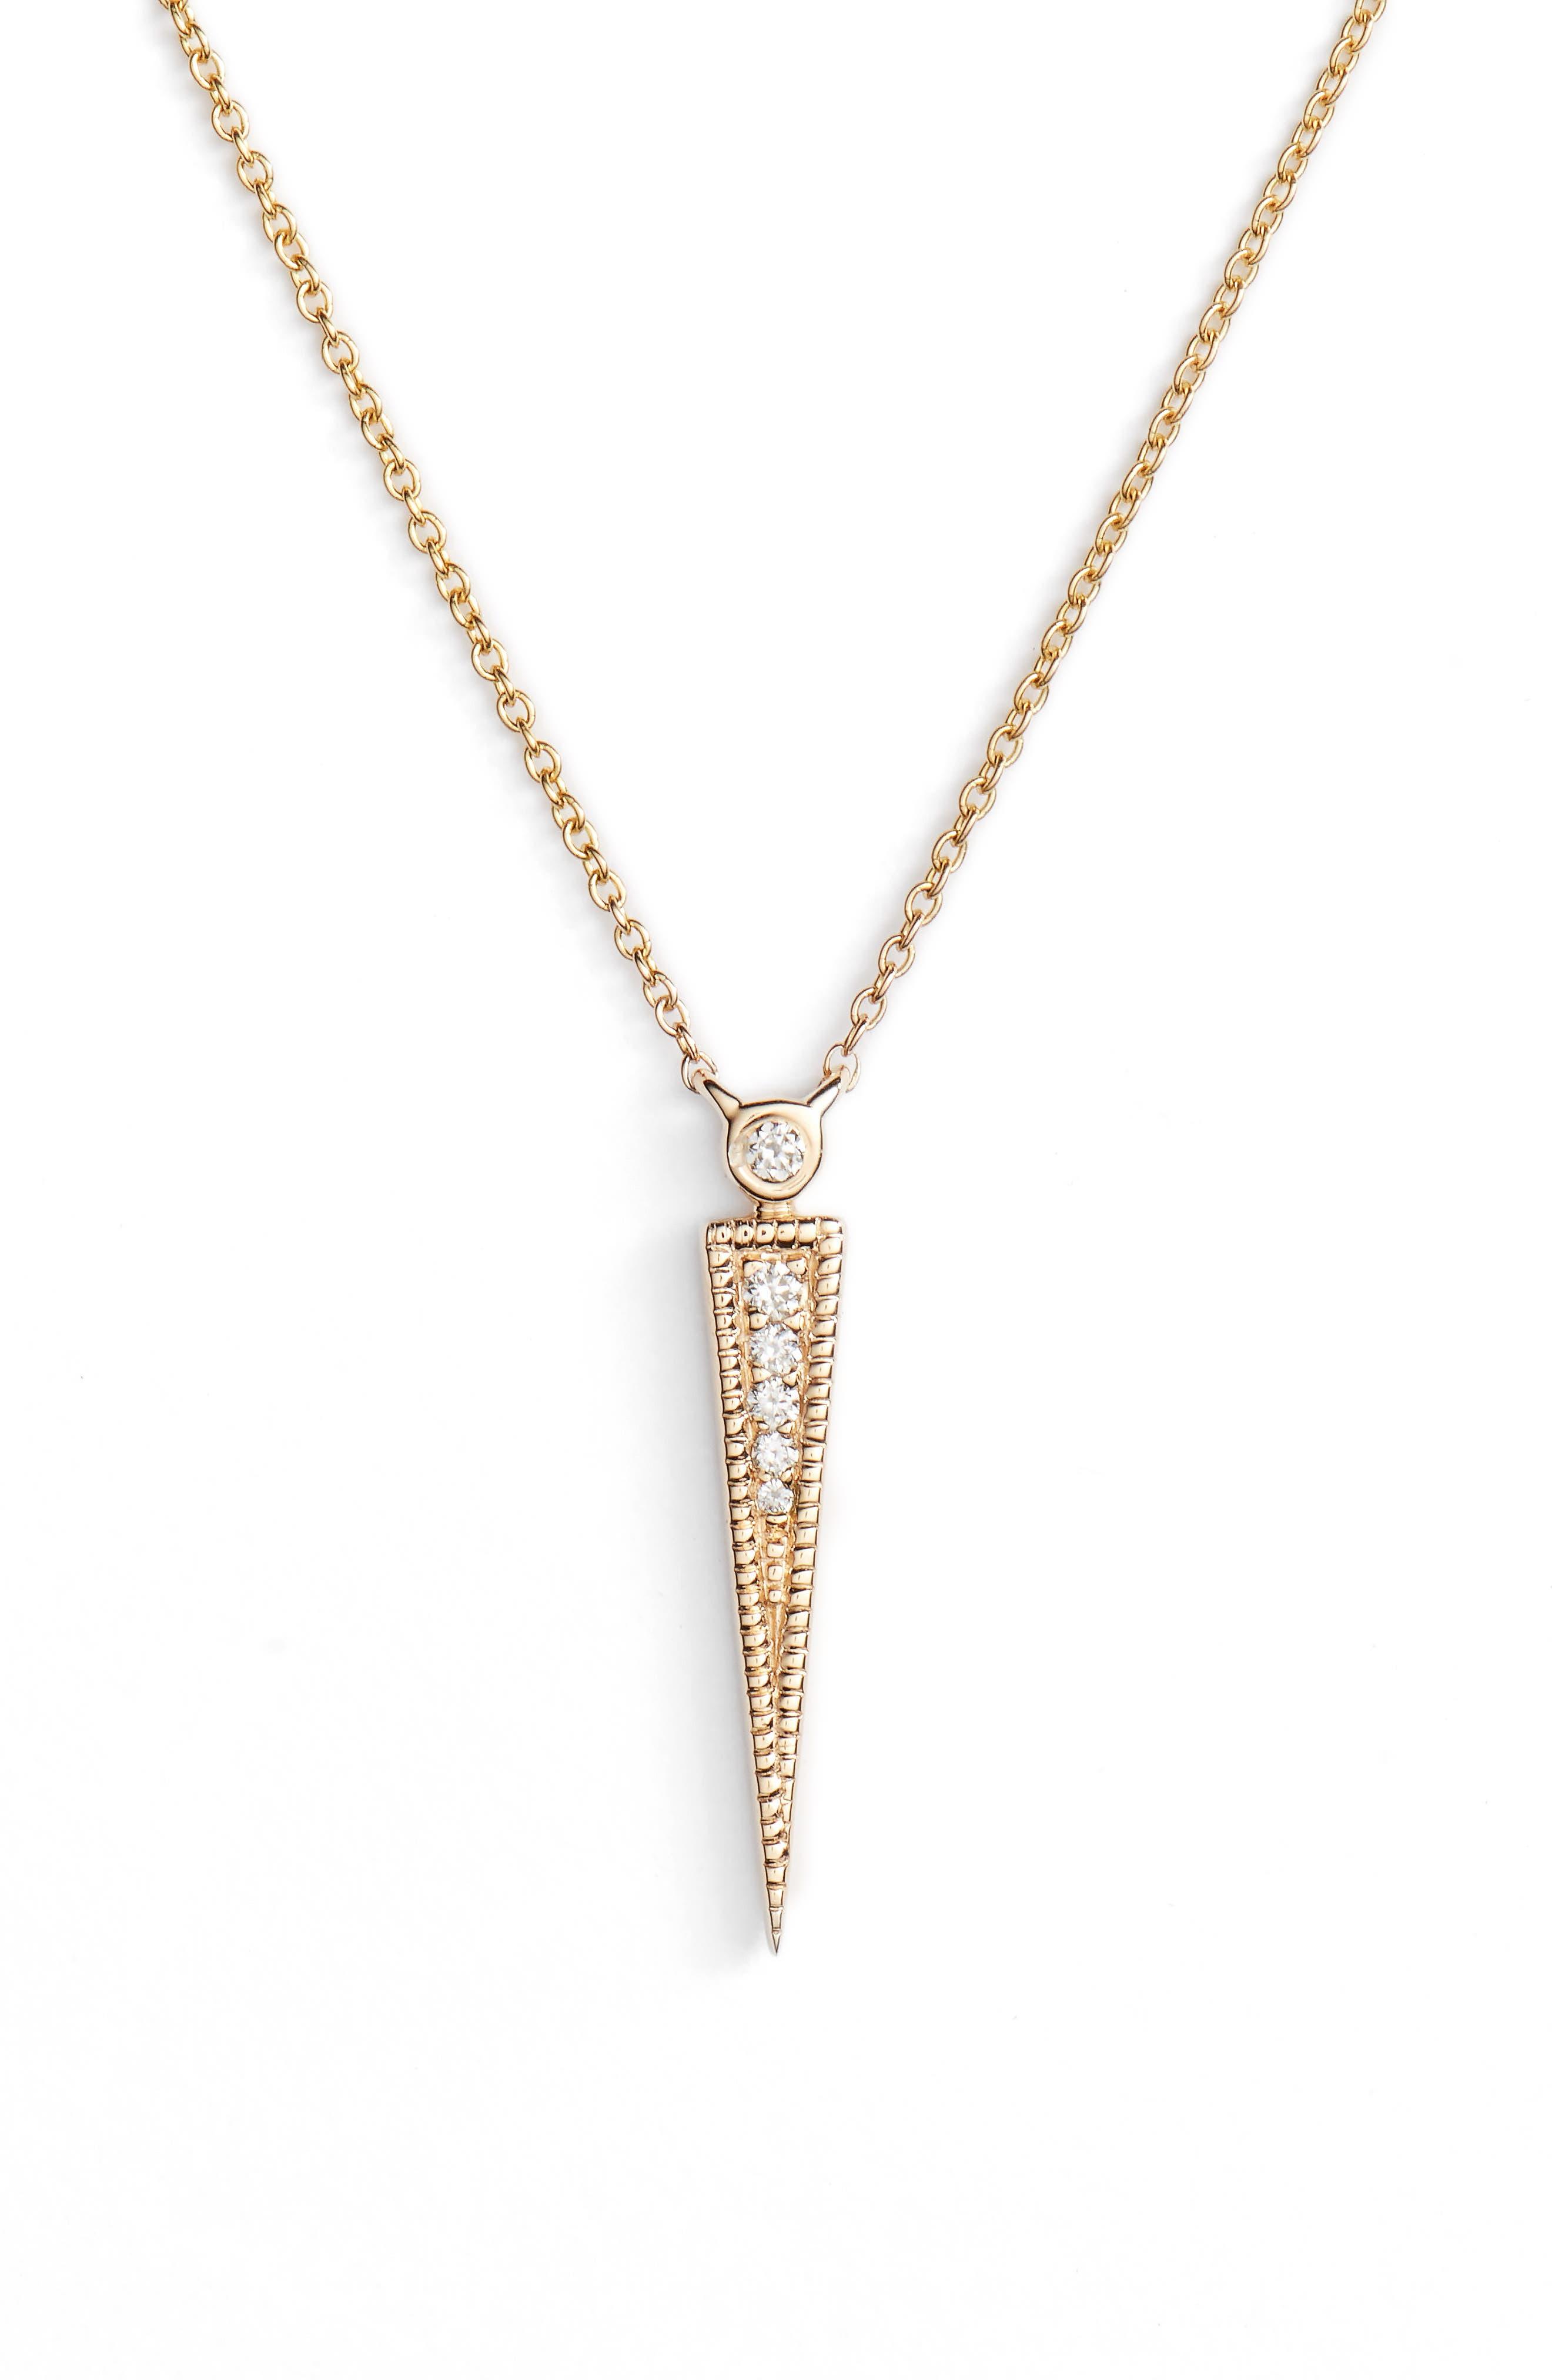 Dana Rebecca Samantha Lynn Diamond Dagger Necklace